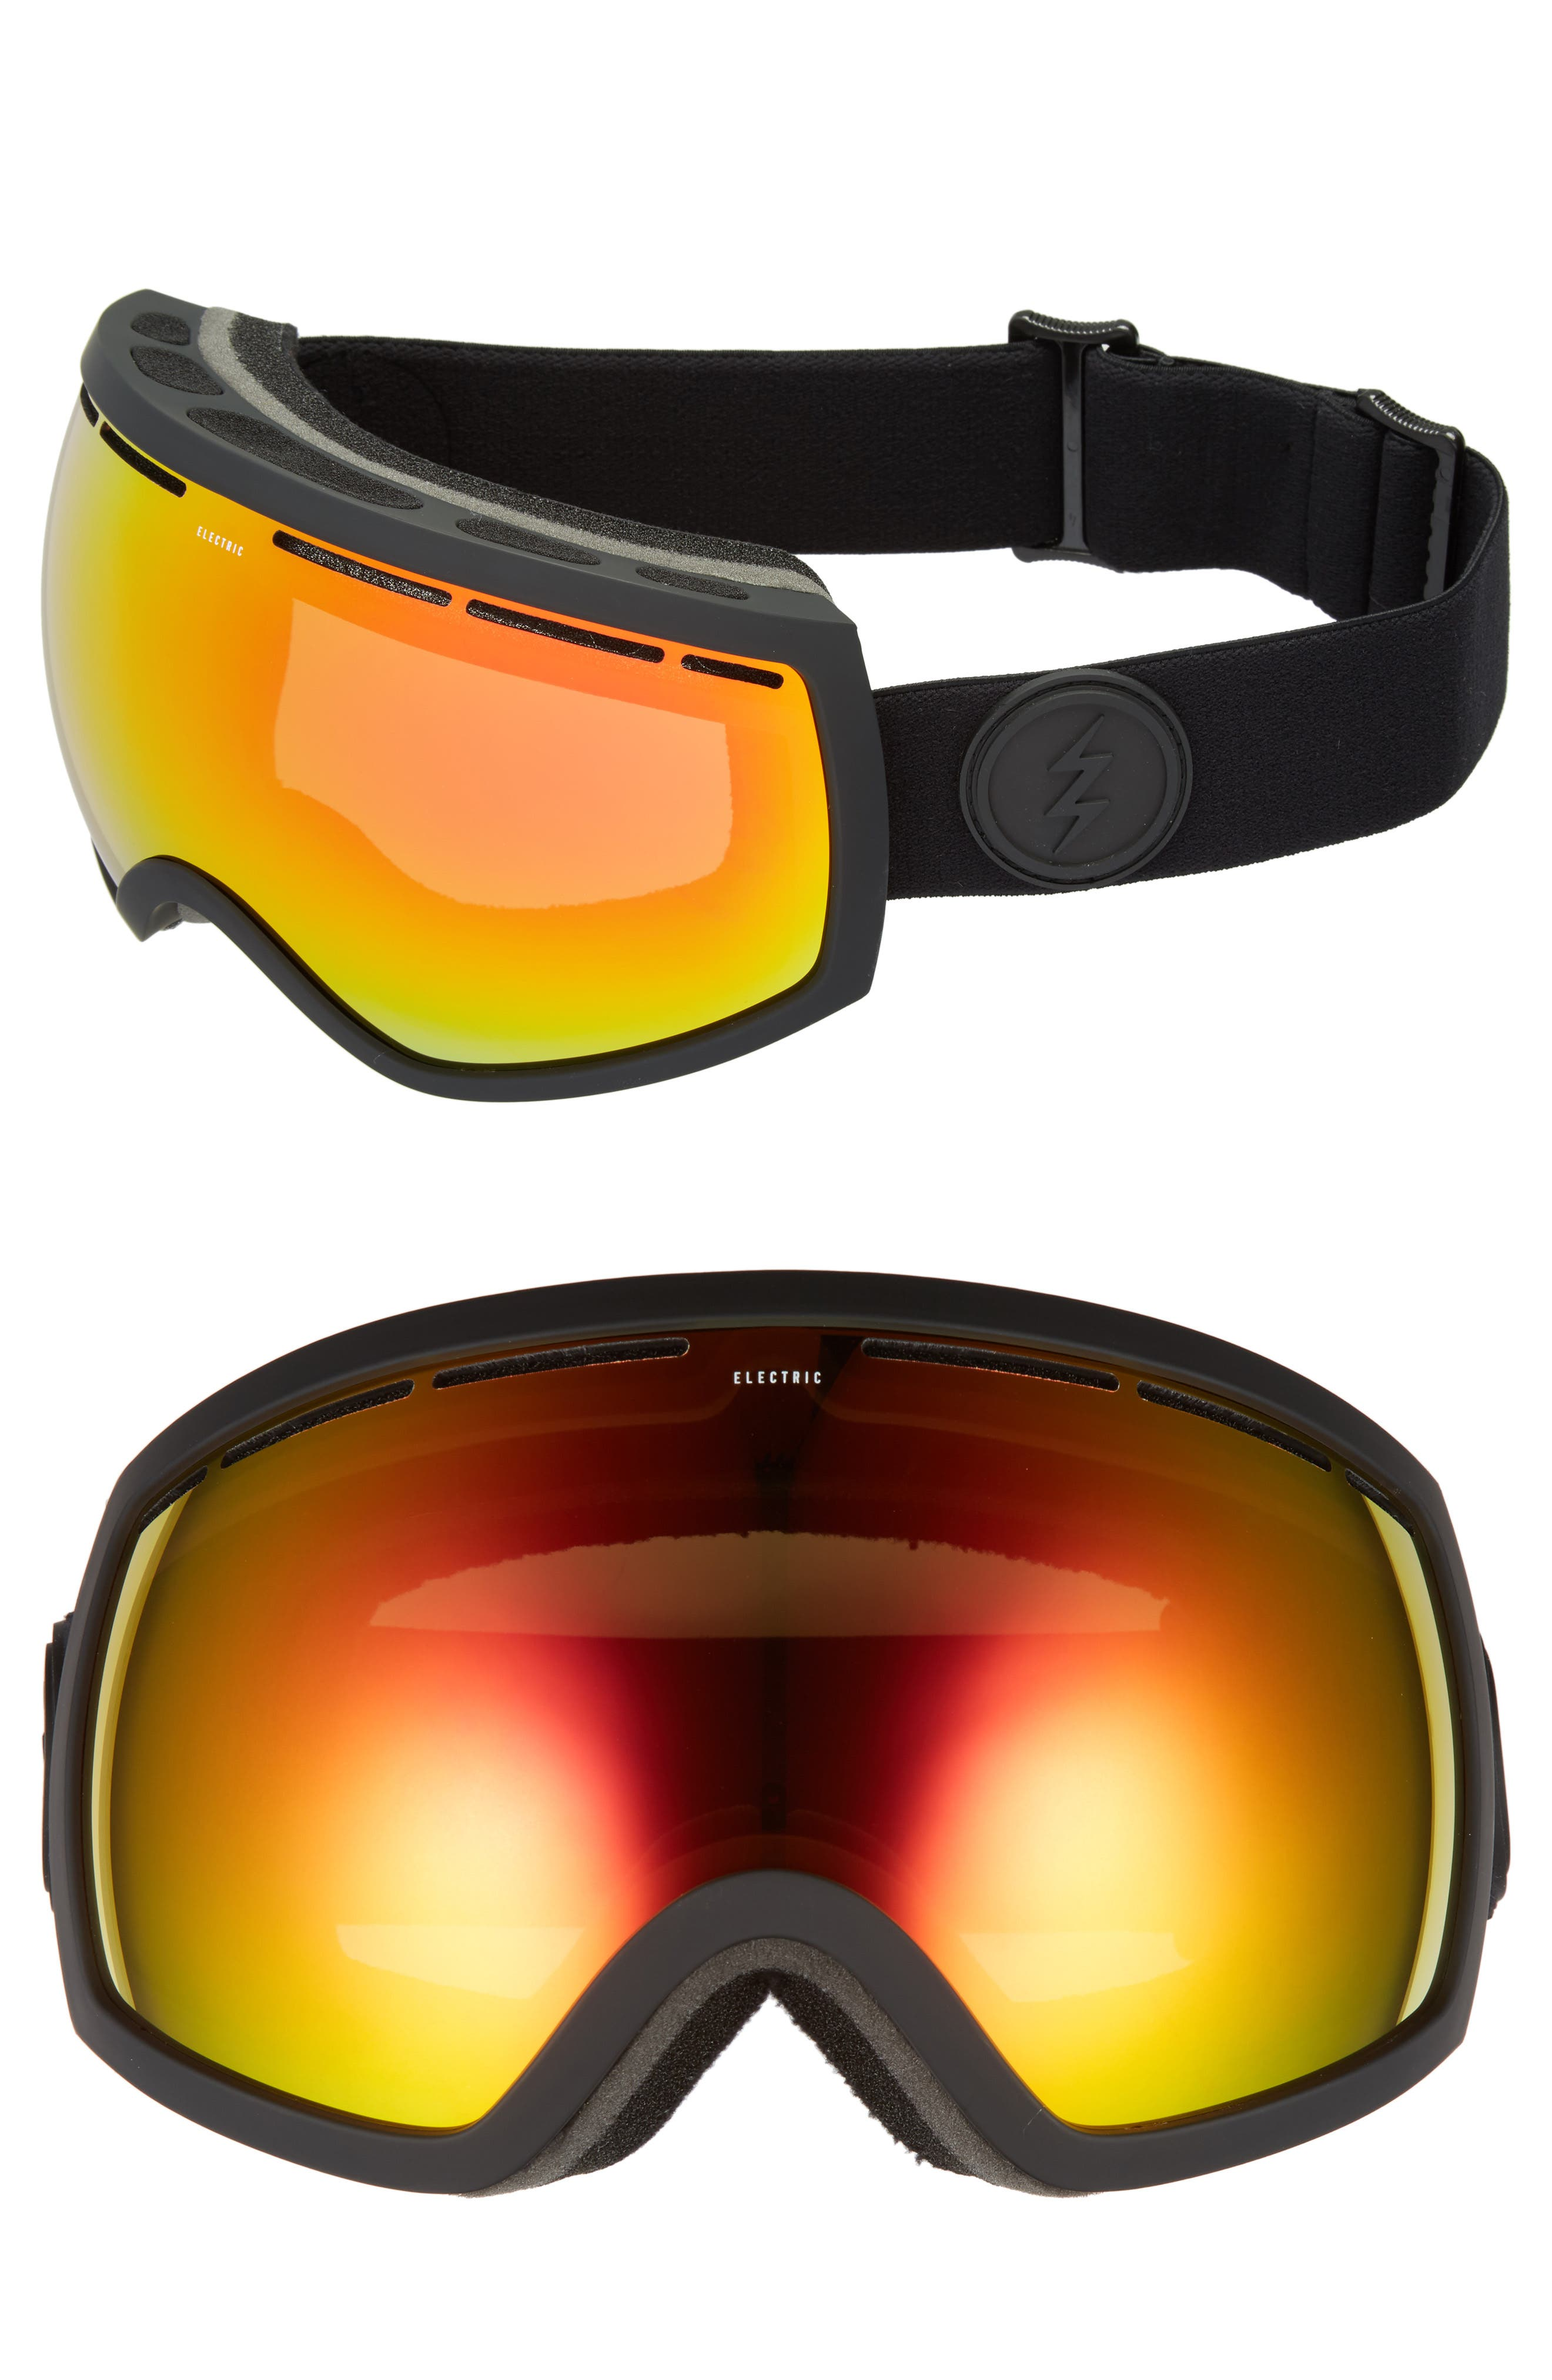 EG2 Snow Goggles,                         Main,                         color, MATTE BLACK/ RED CHROME